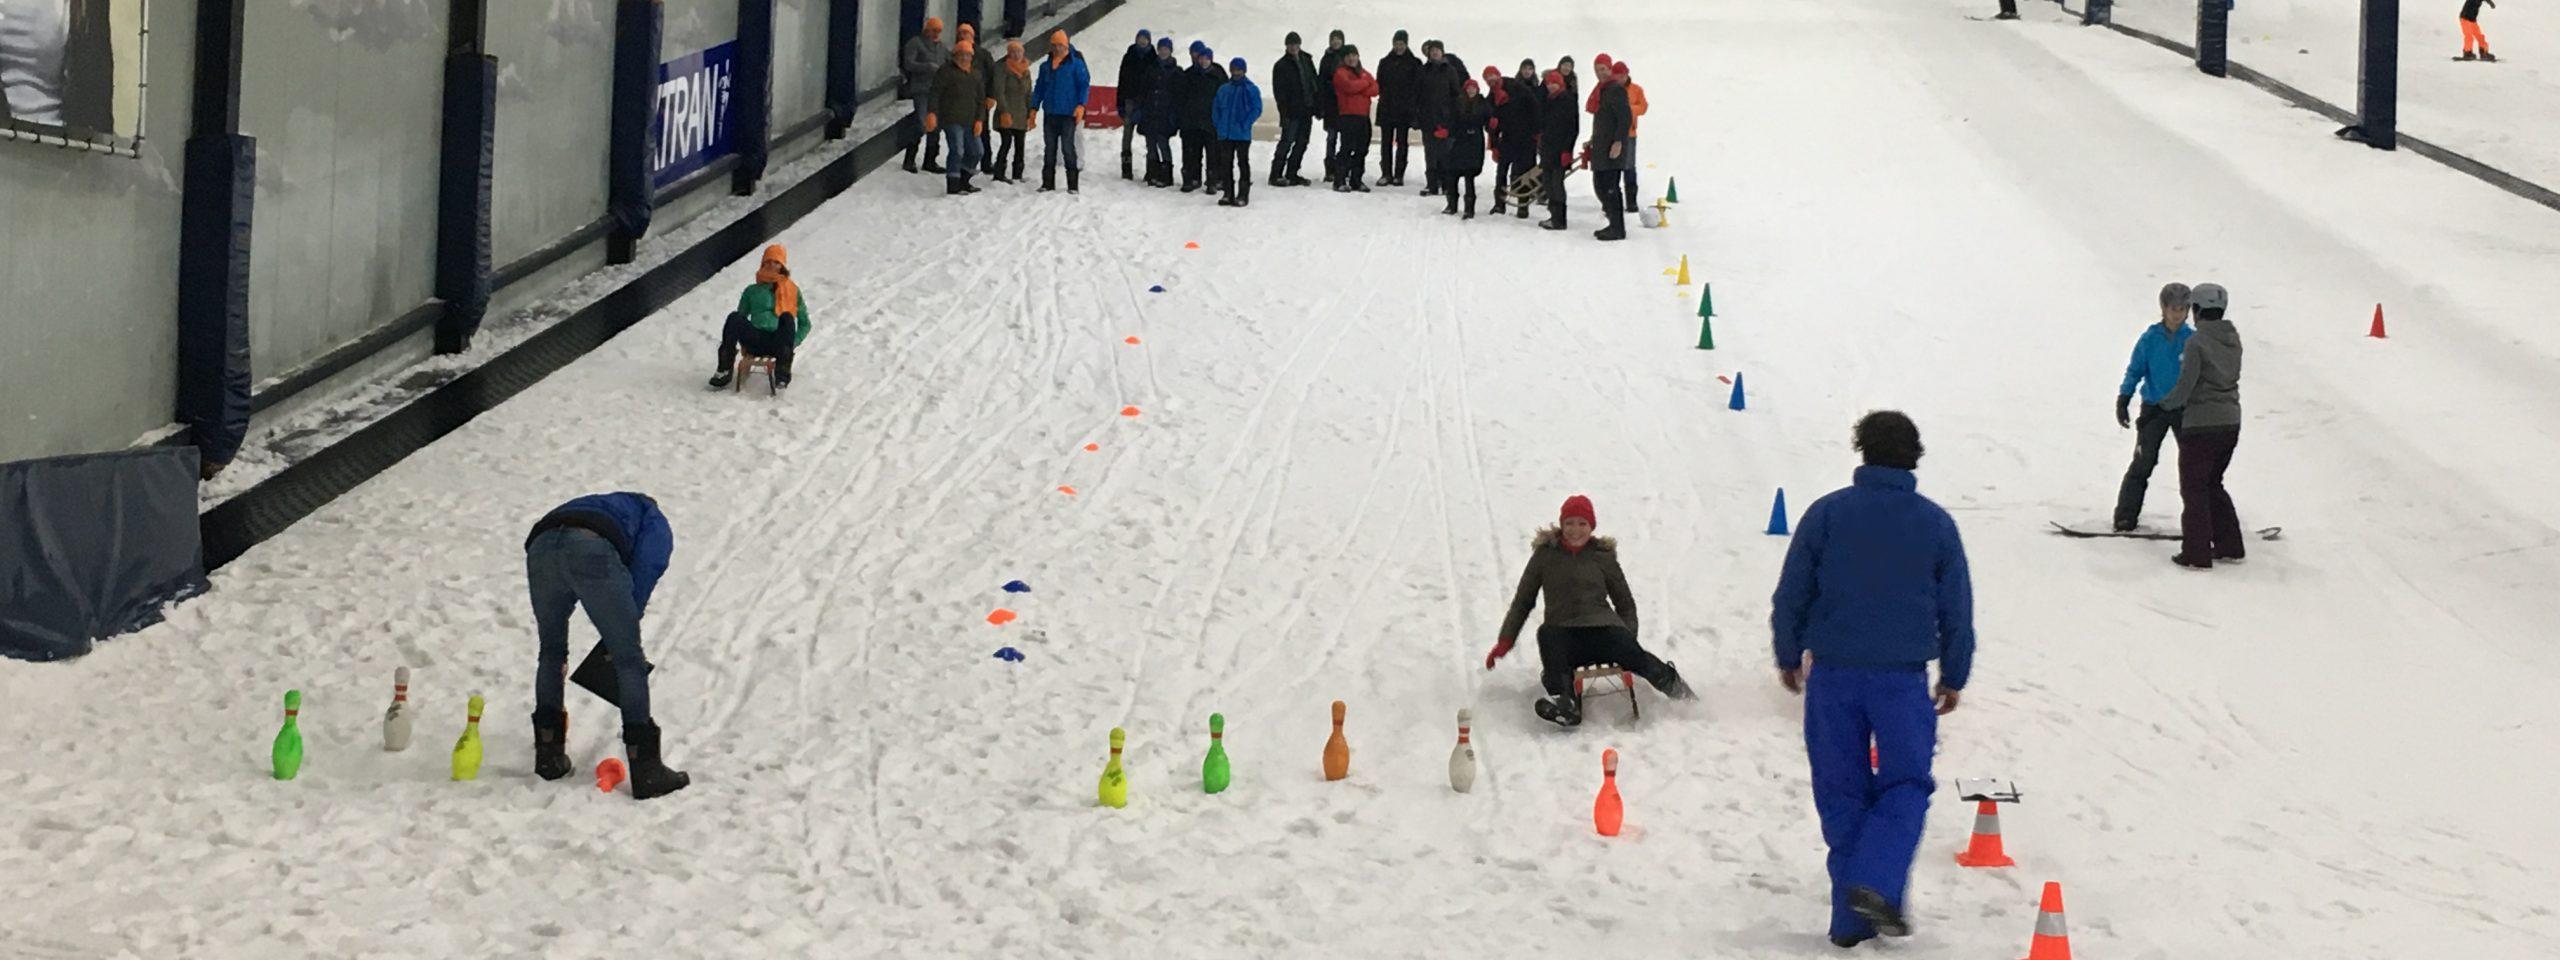 Sneeuwspelen Tilburg